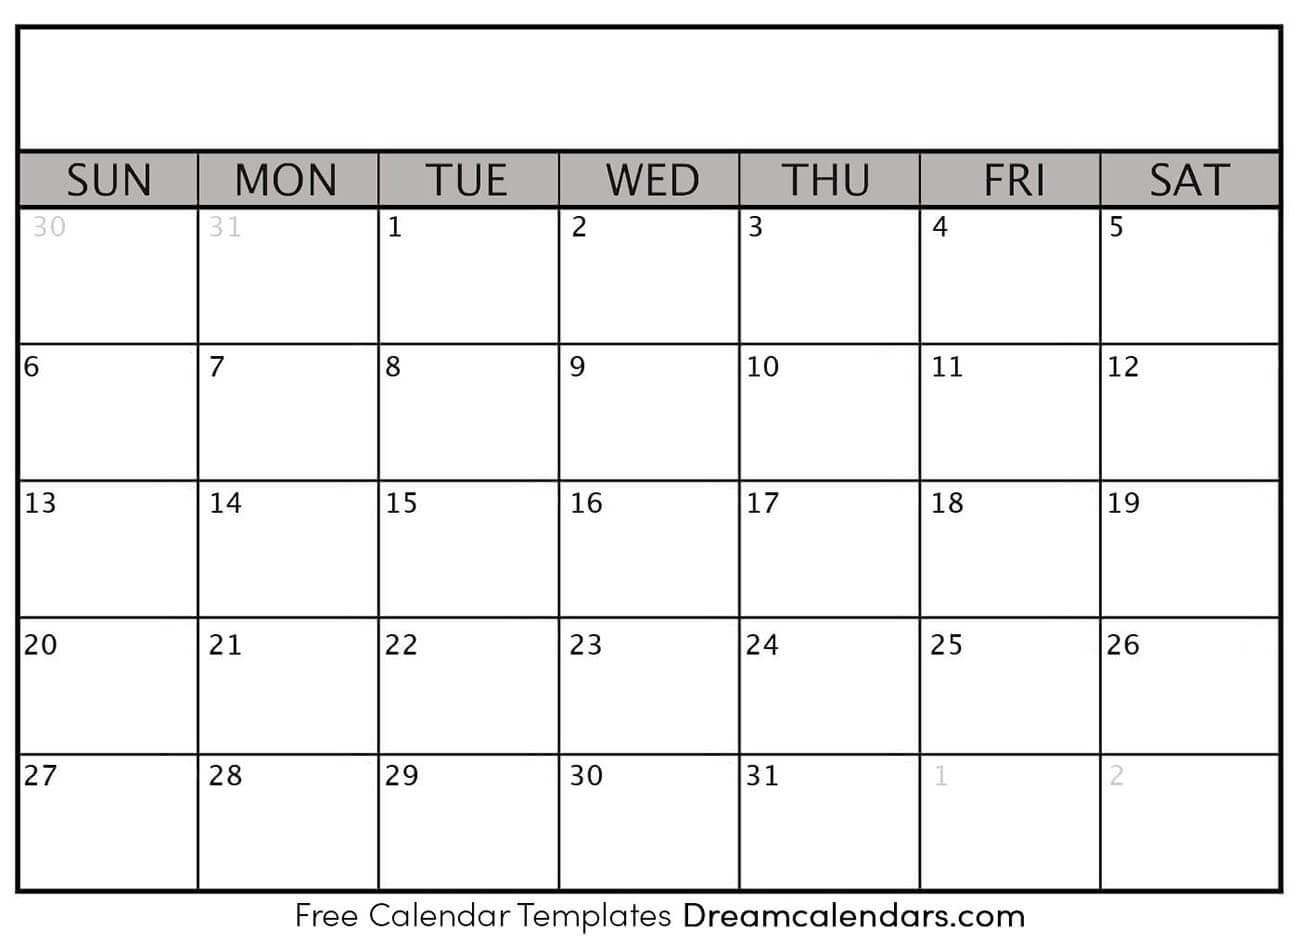 Blank Calendar - Printable Blank Calendar 2021-Free Blank No Date Printable Calendar 2021